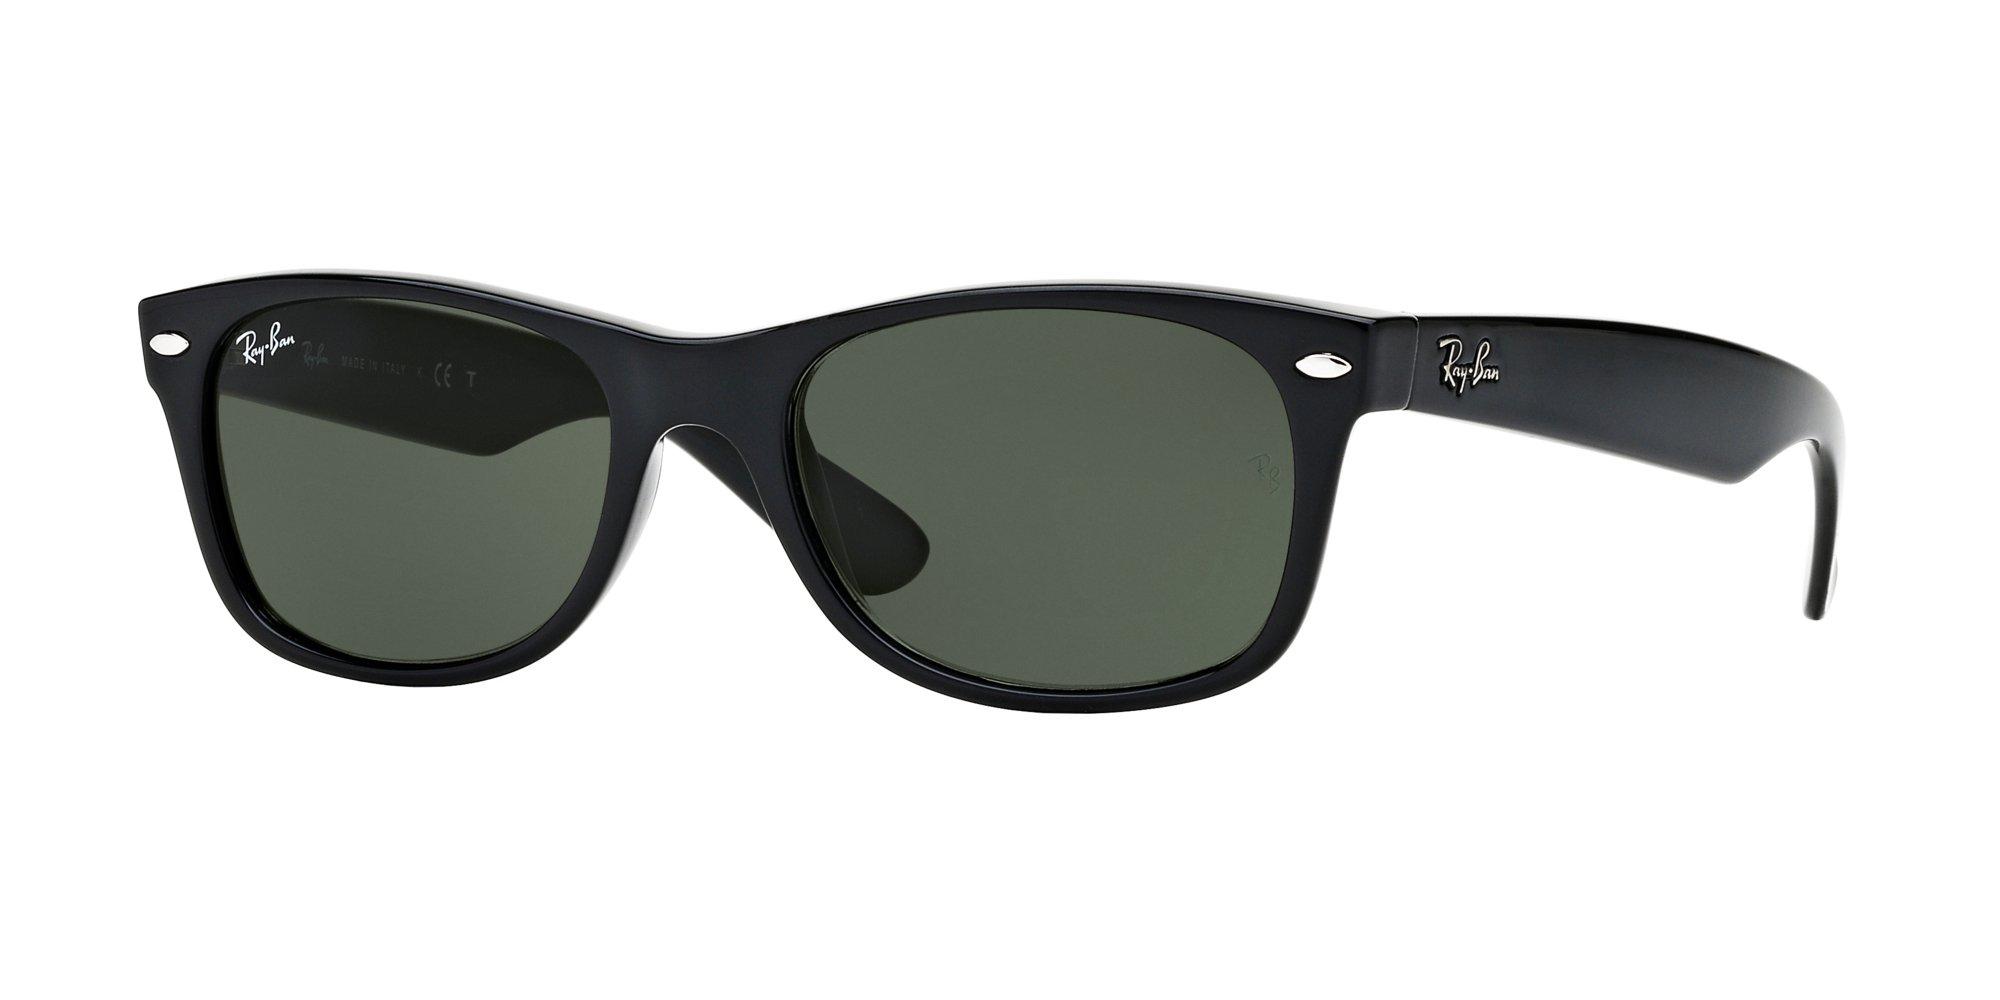 Ray Ban RB2132 901 58M Black/Green+FREE Complimentary Eyewear Care Kit